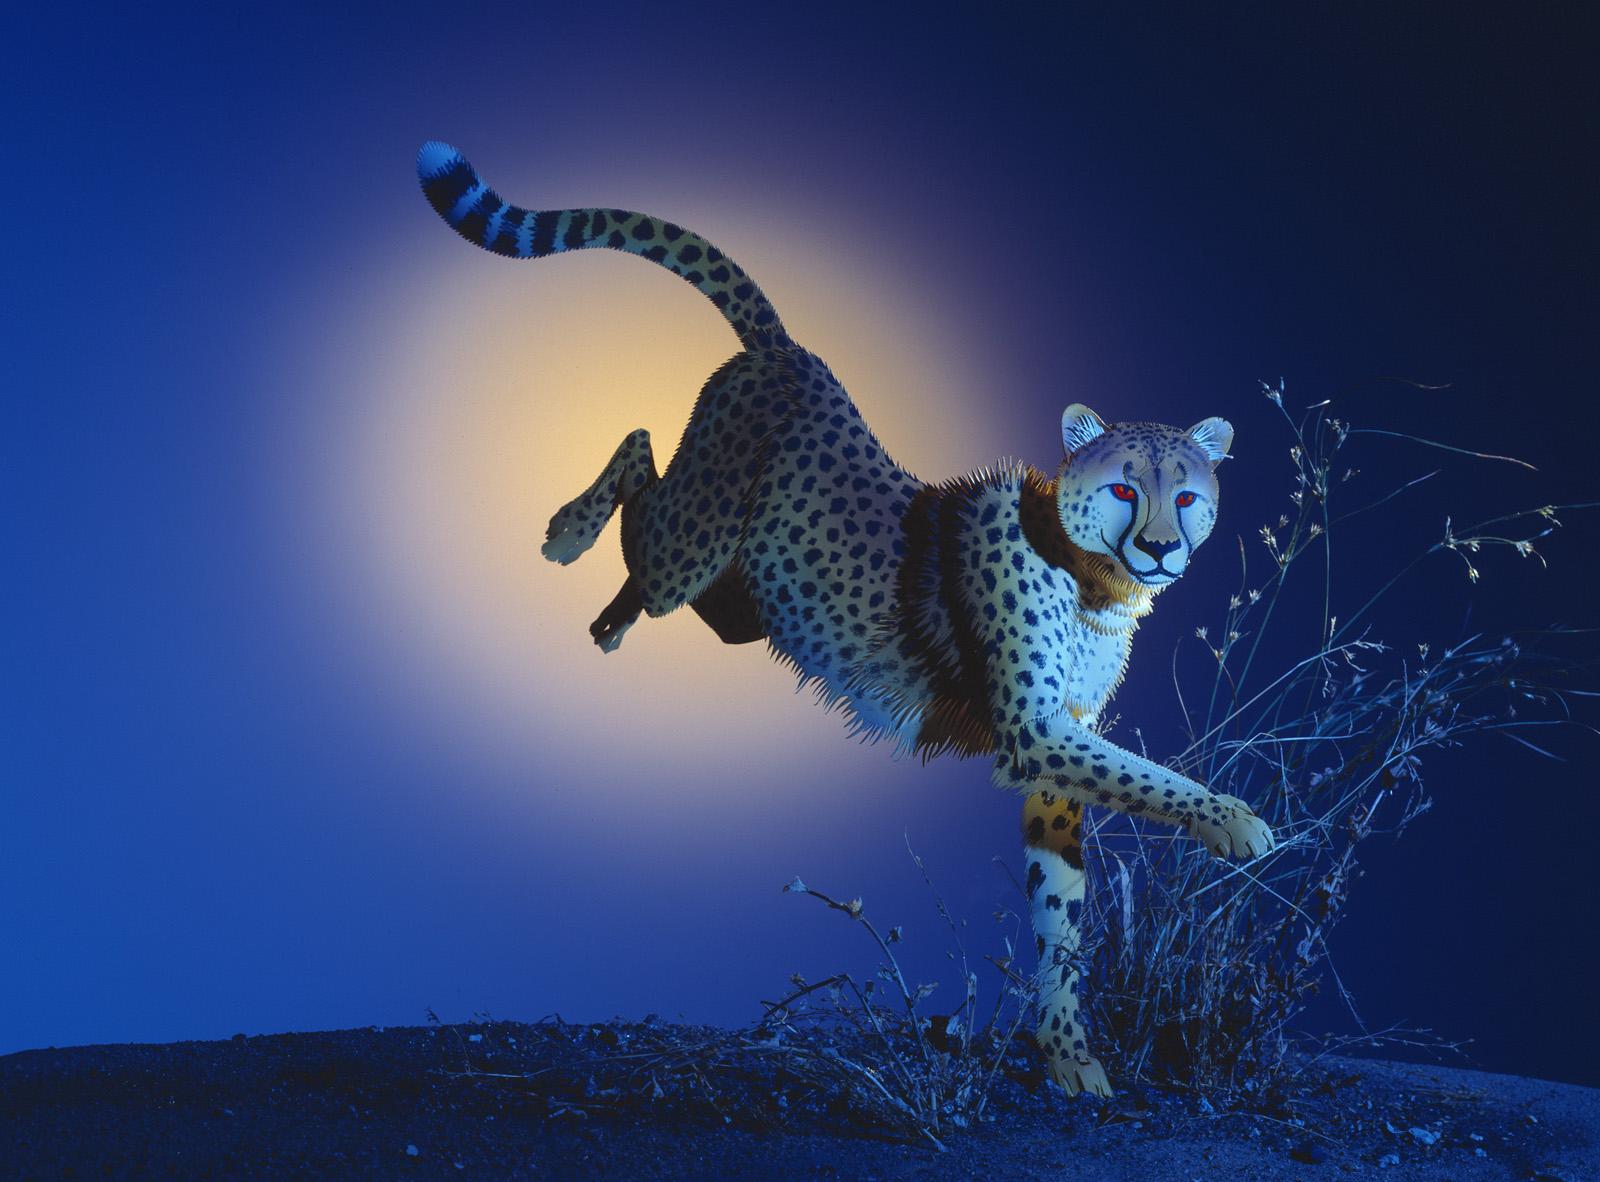 Running Cheetah copy